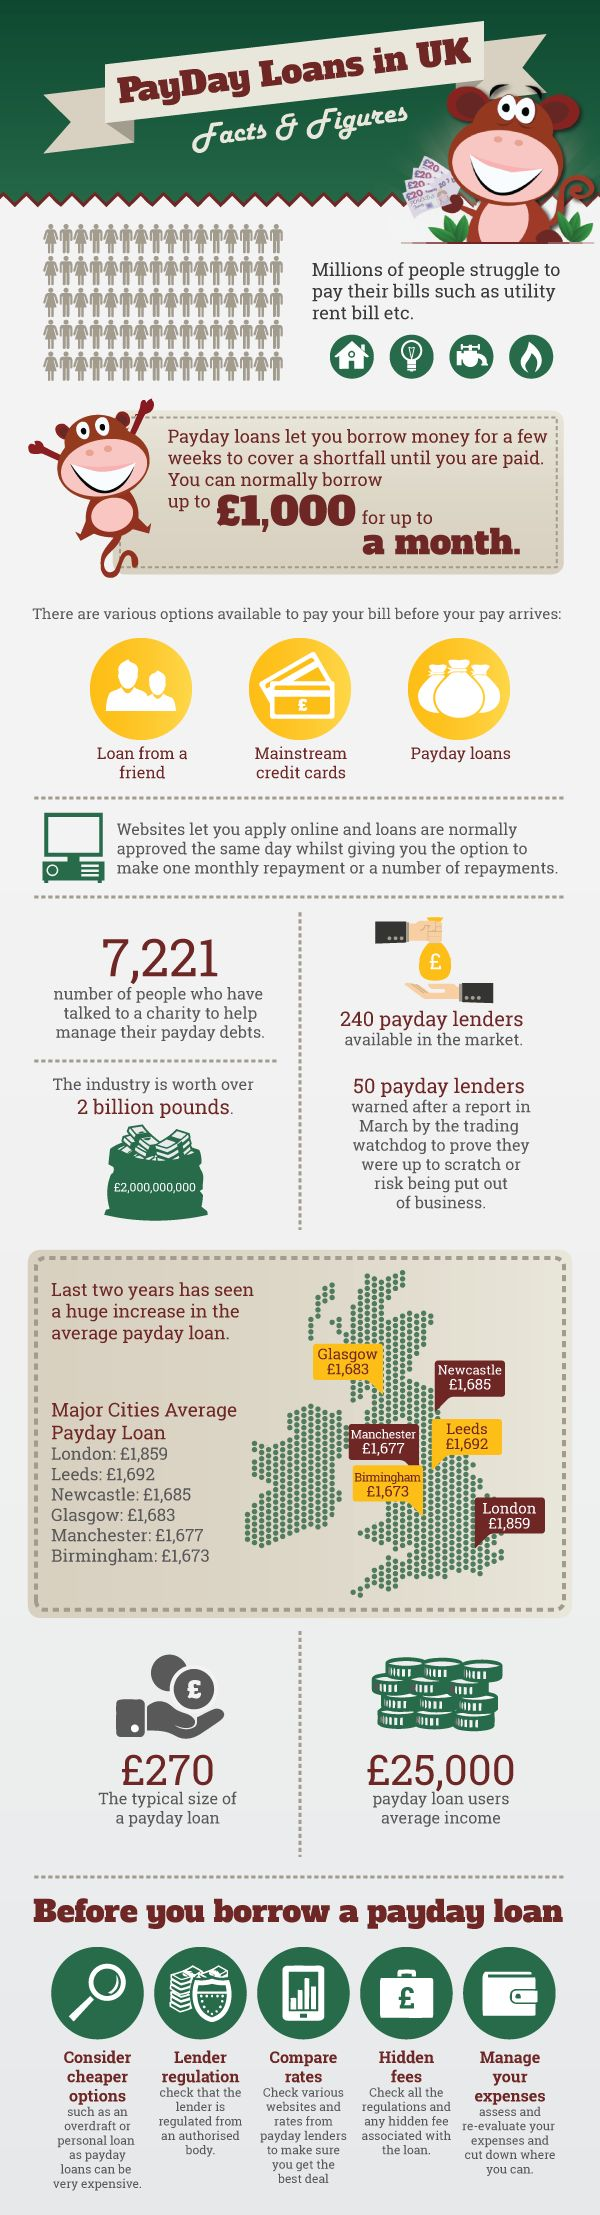 Payday loan las vegas henderson photo 8